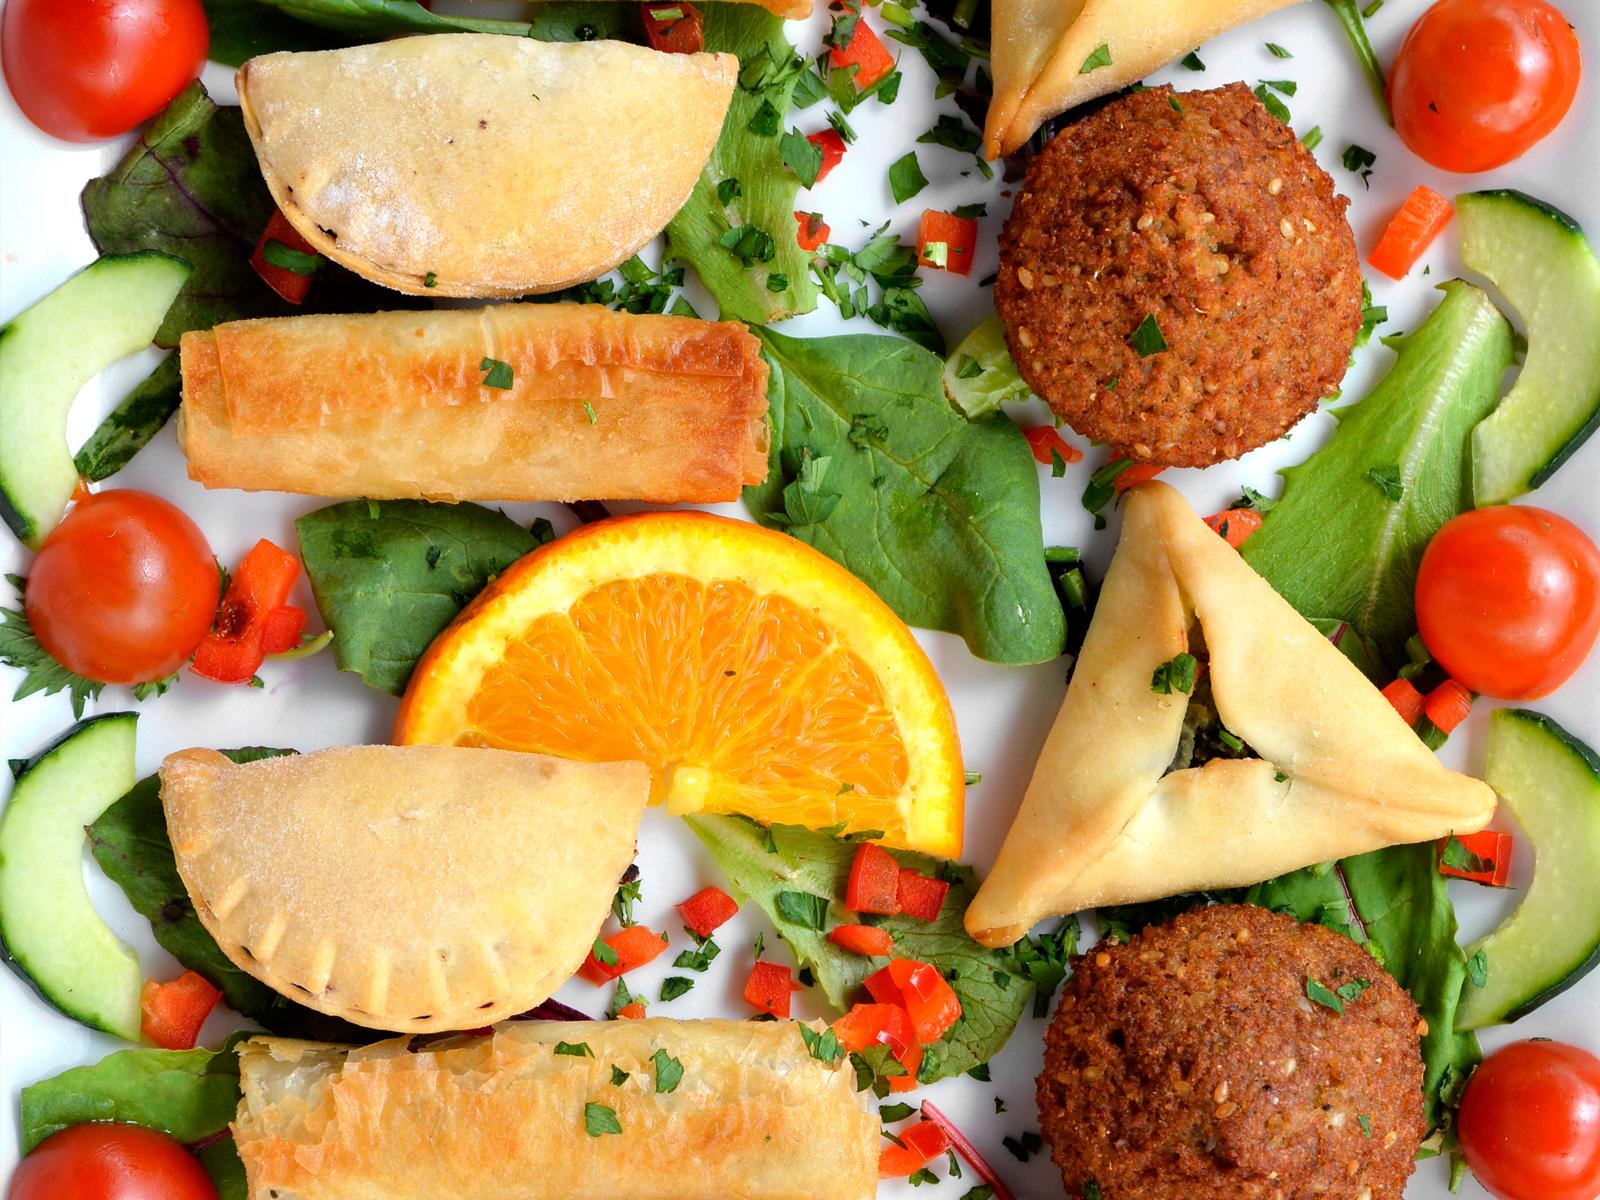 BEYRITS livraison restaurant libanais Aix